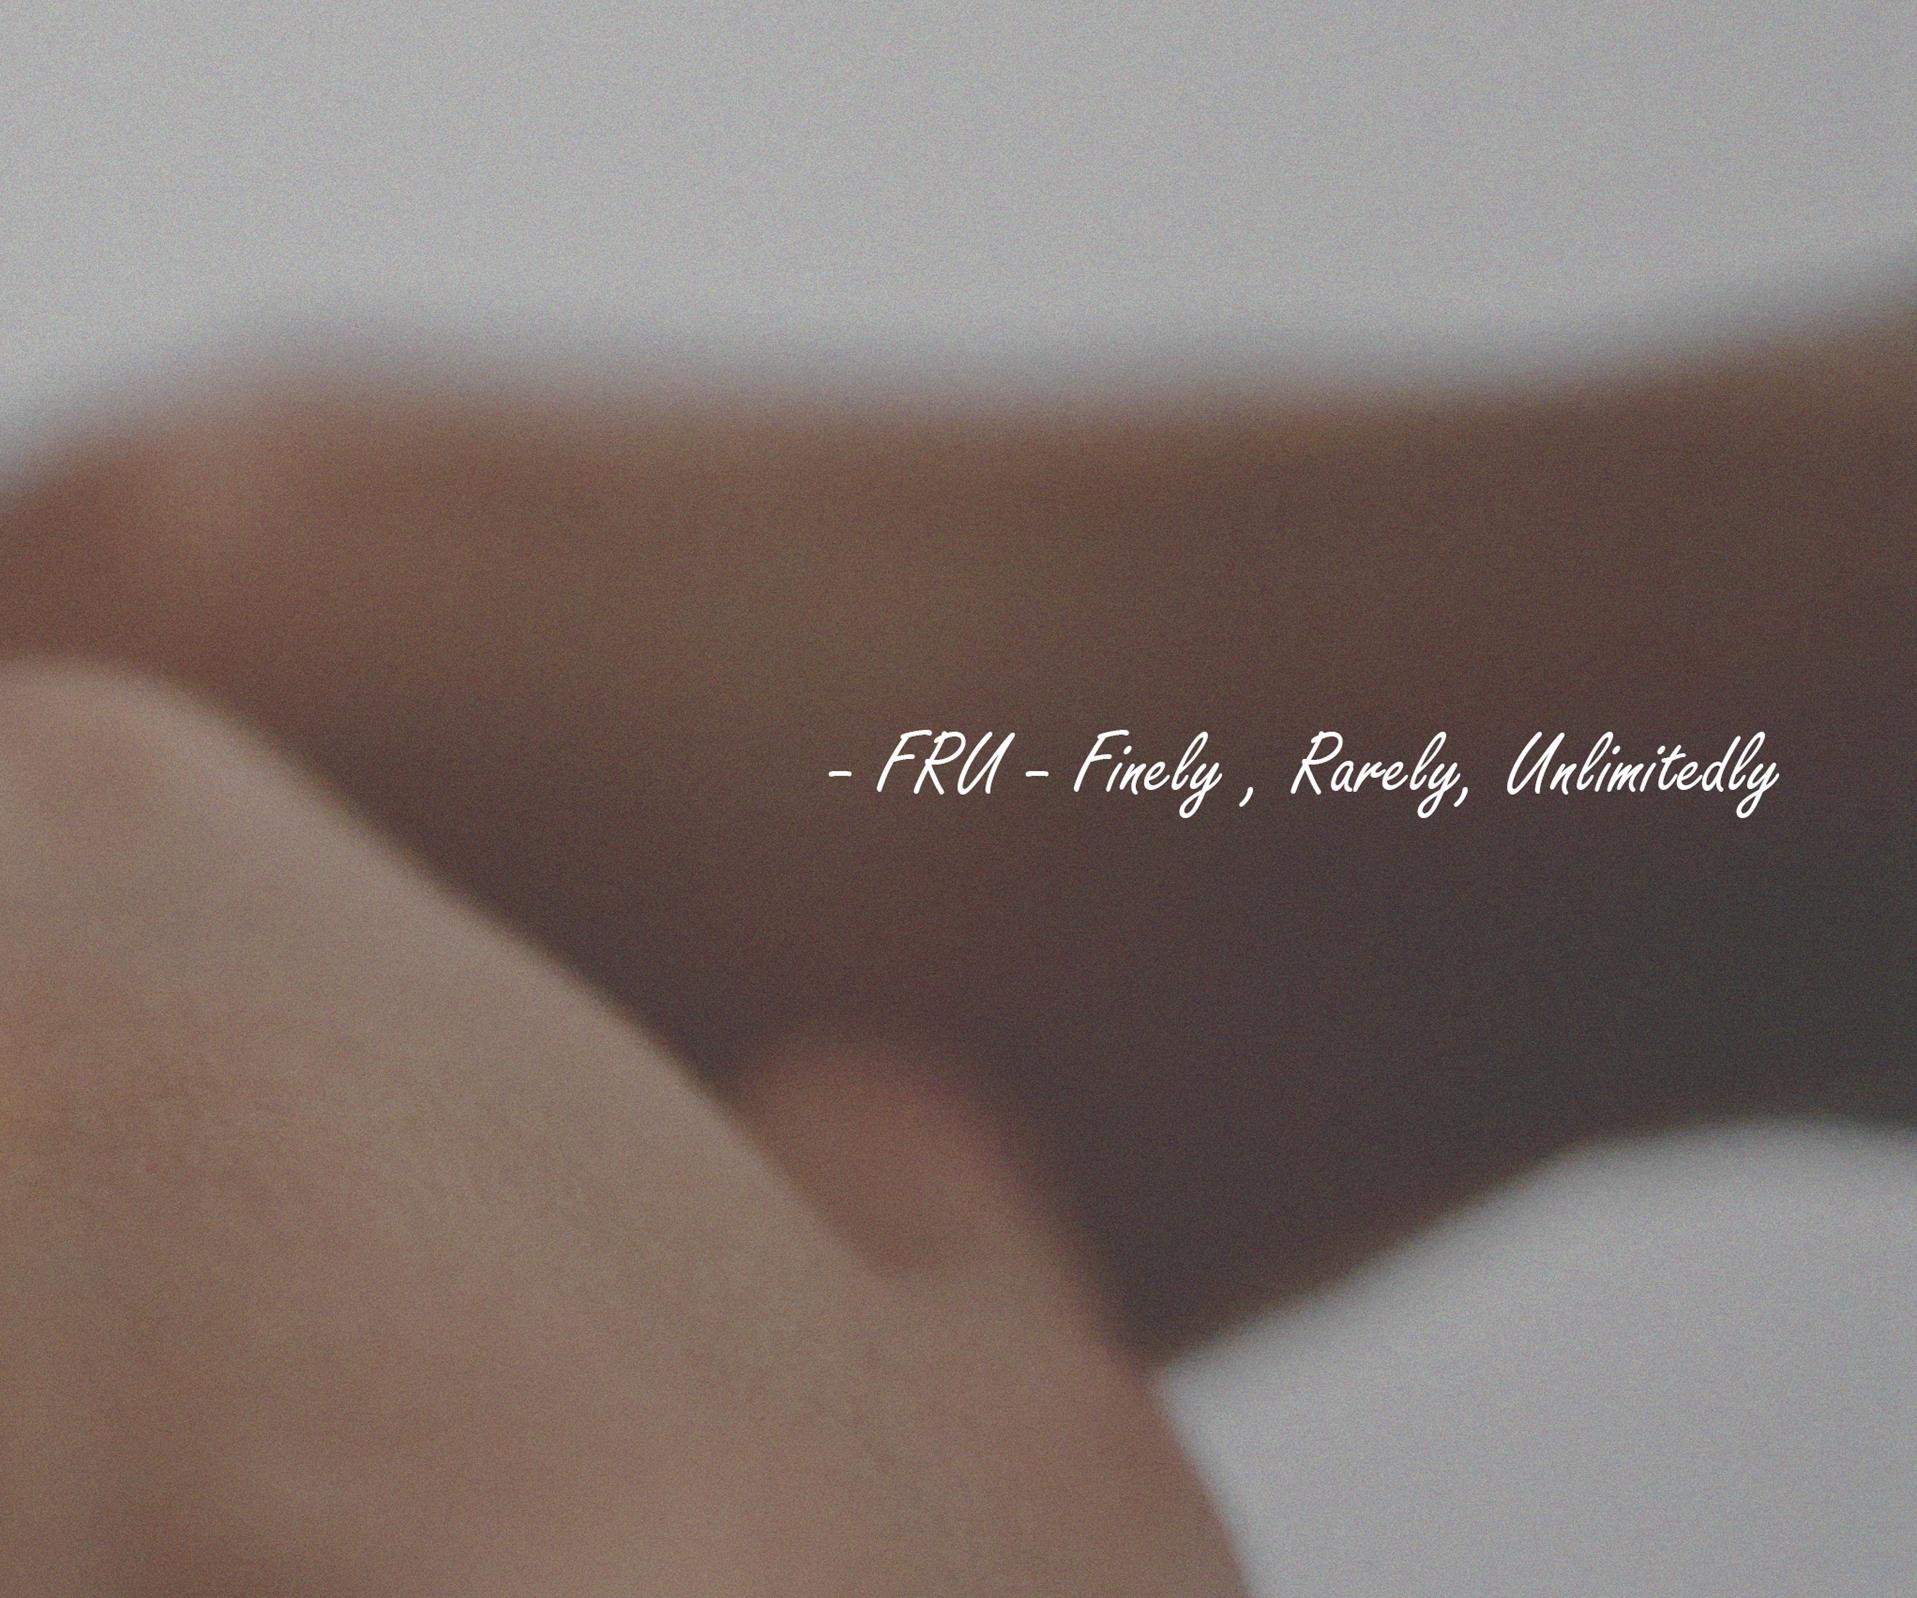 - FRU - Finely , Rarely, Unlimitedly -.jpg